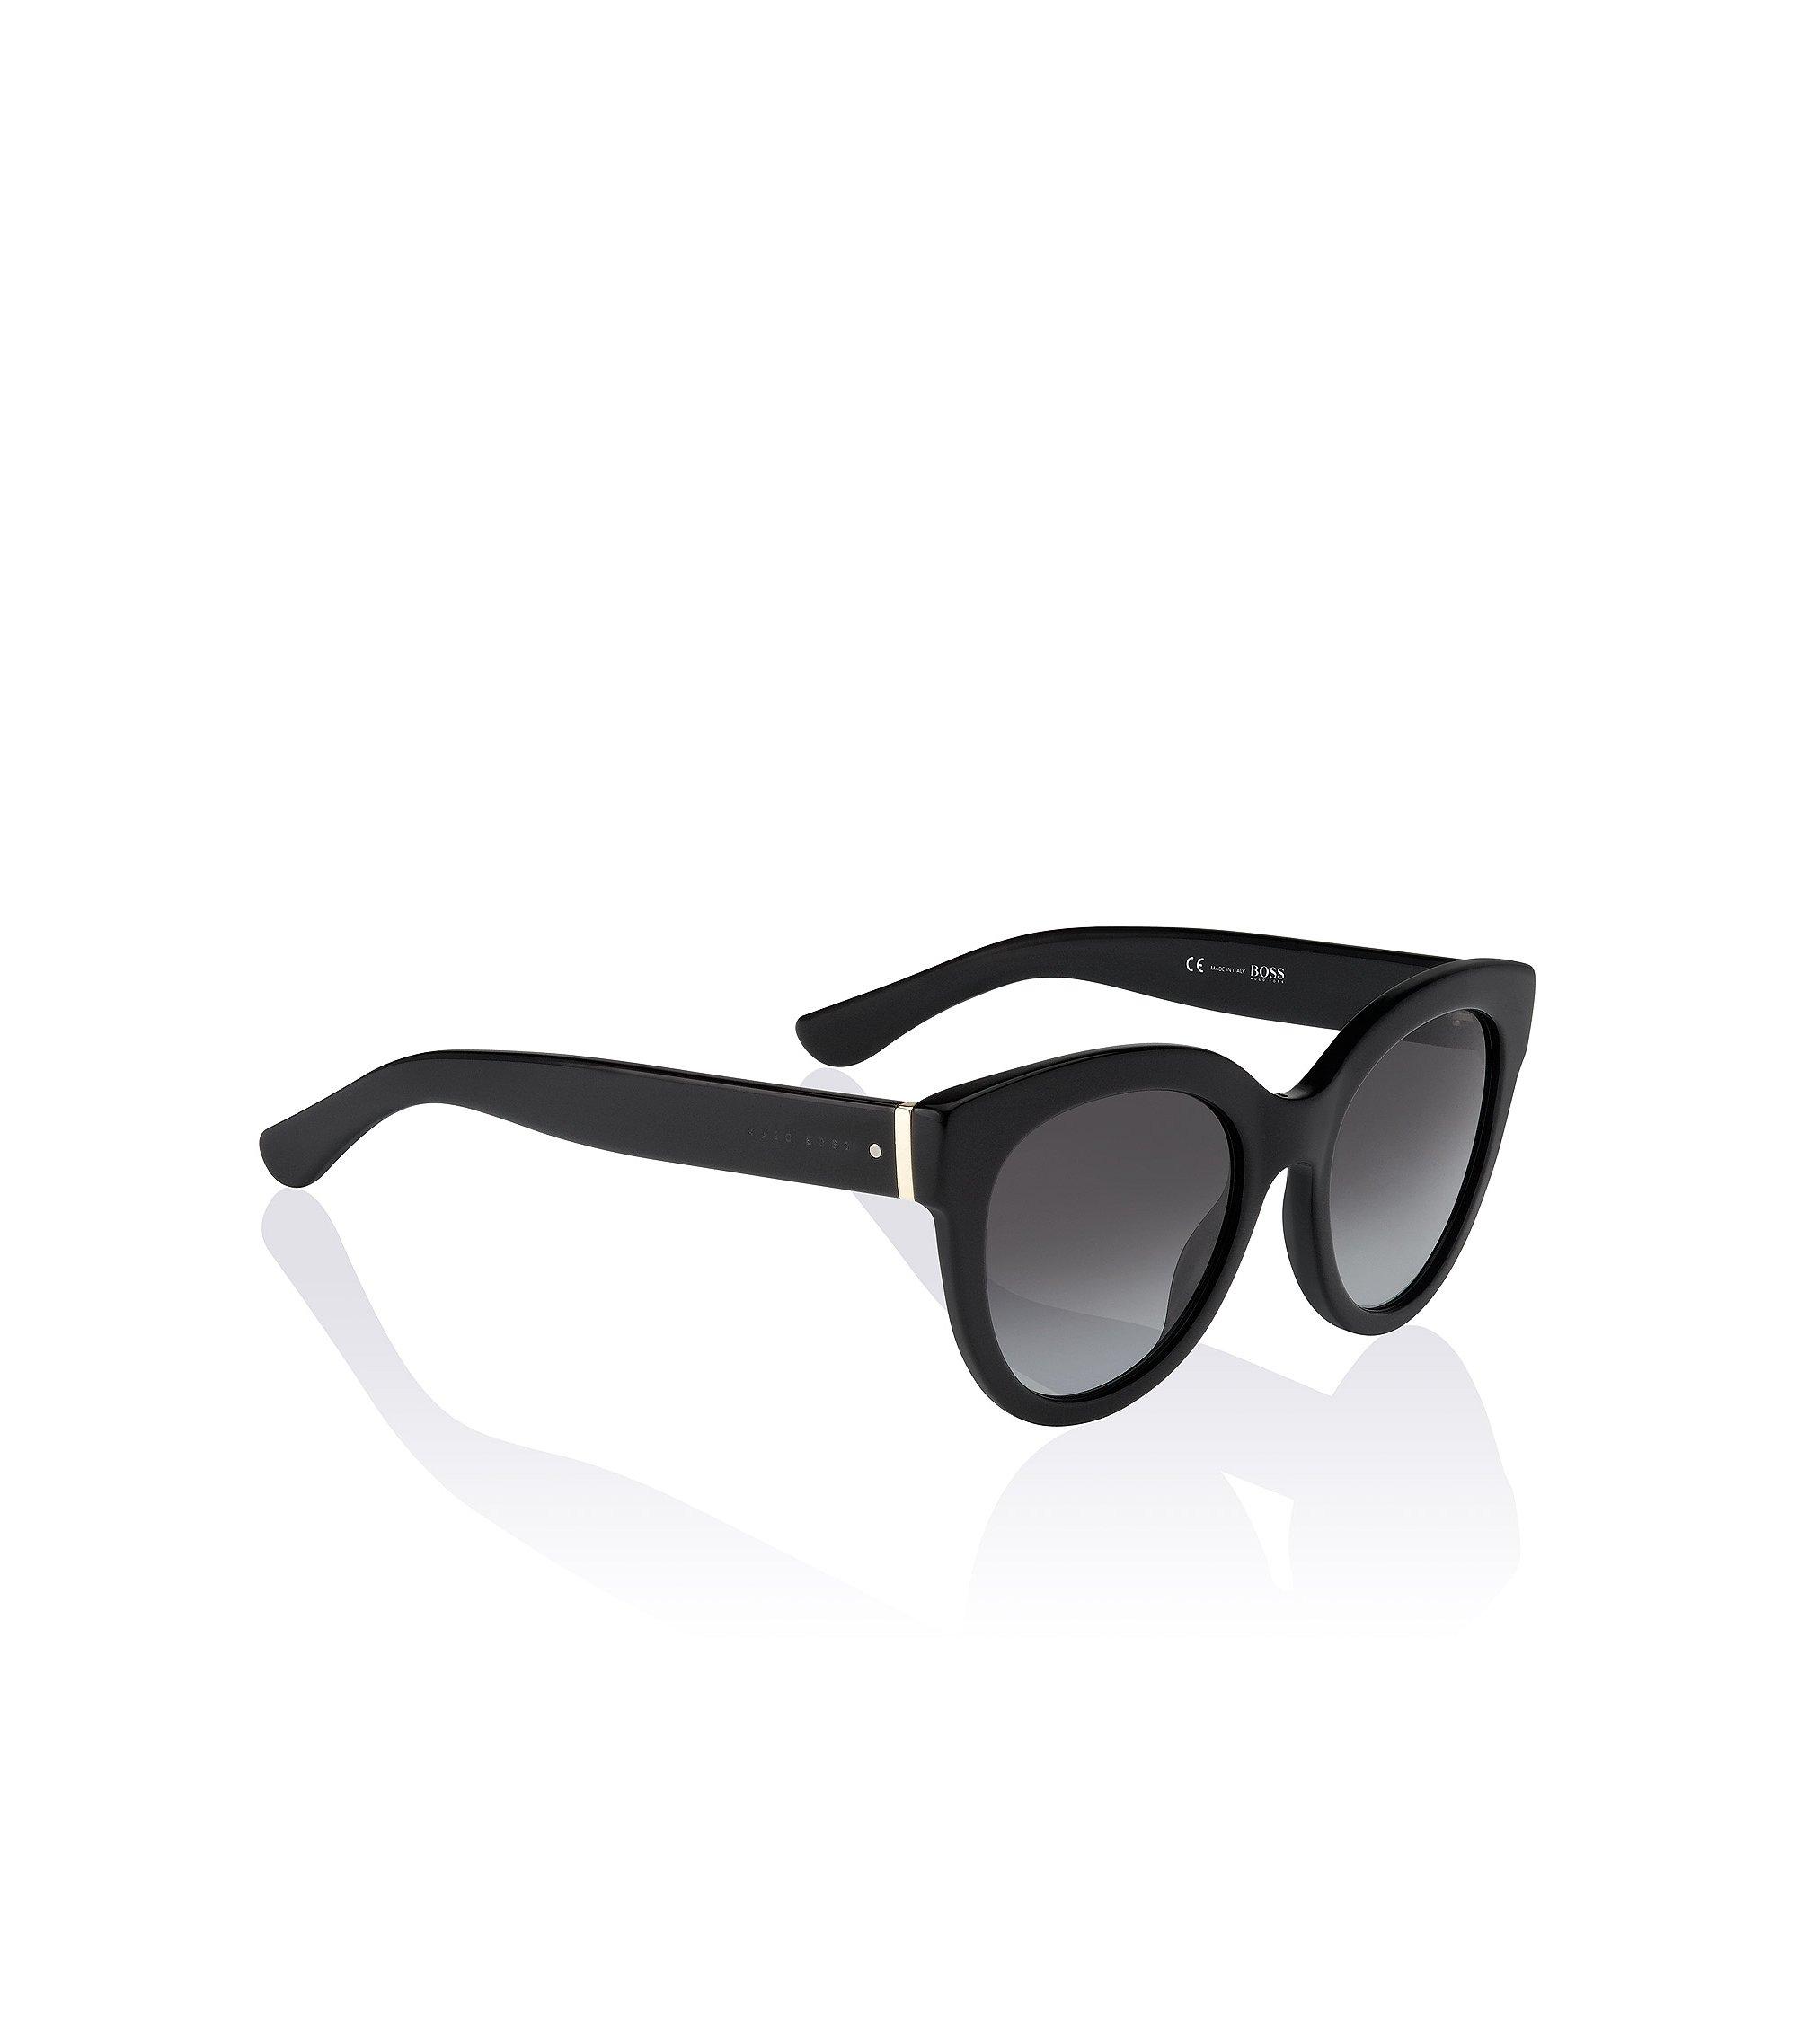 Sonnenbrille ´BOSS 0675` aus Acetat und Metall, Assorted-Pre-Pack